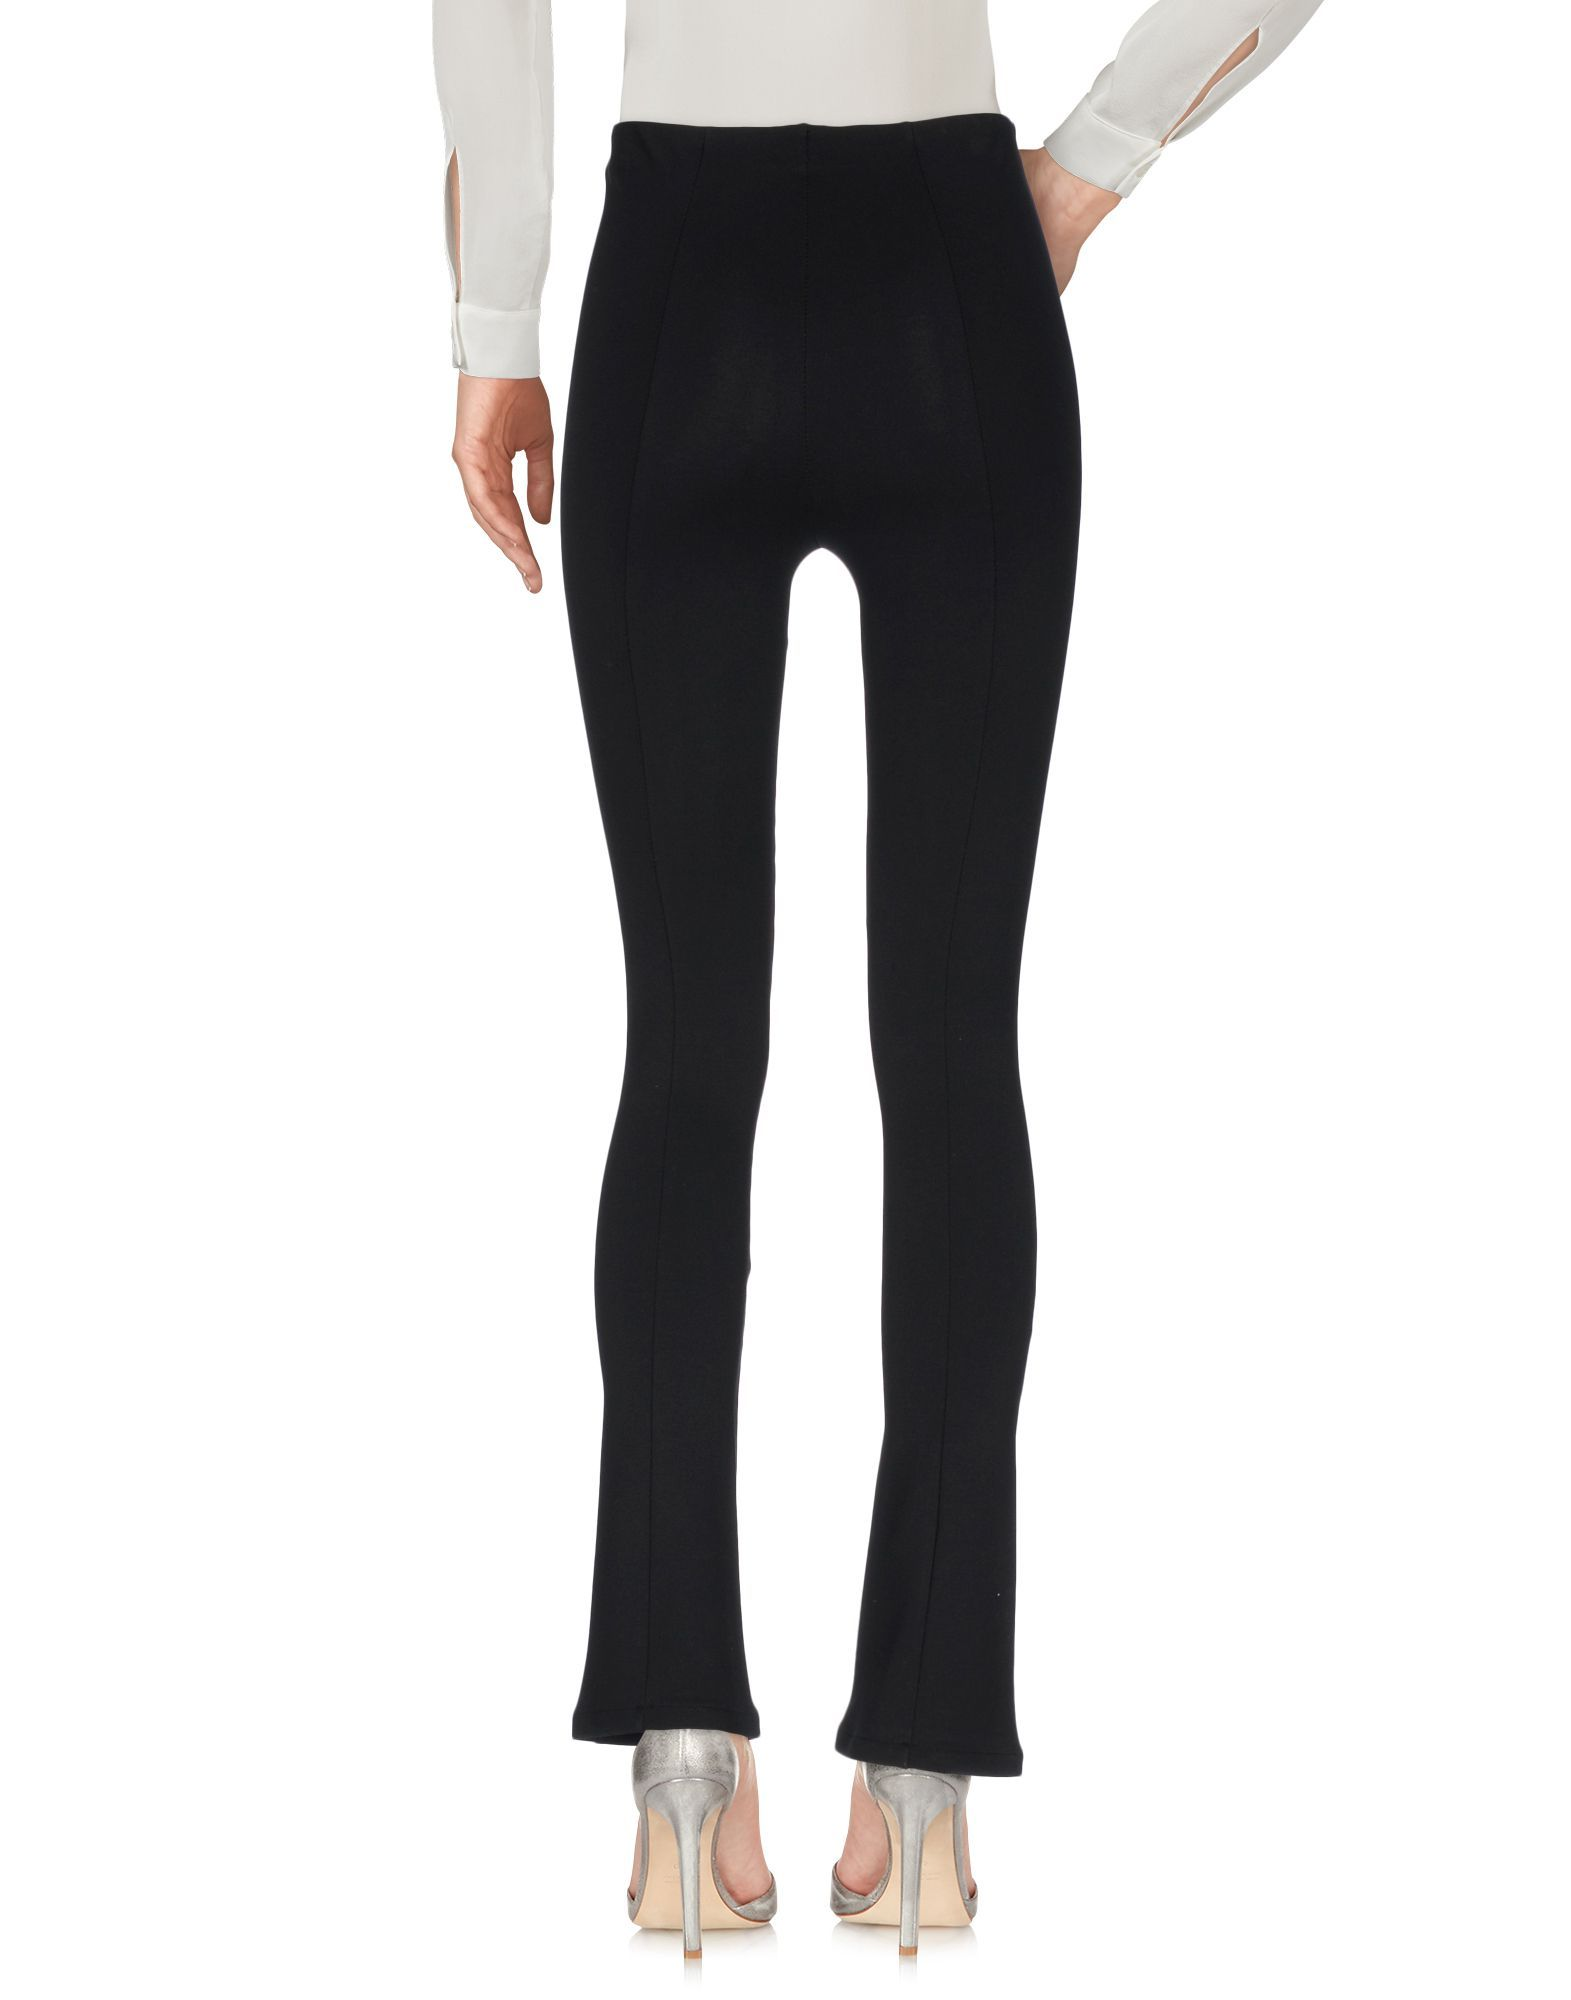 Patrizia Pepe Black Stretch Trousers